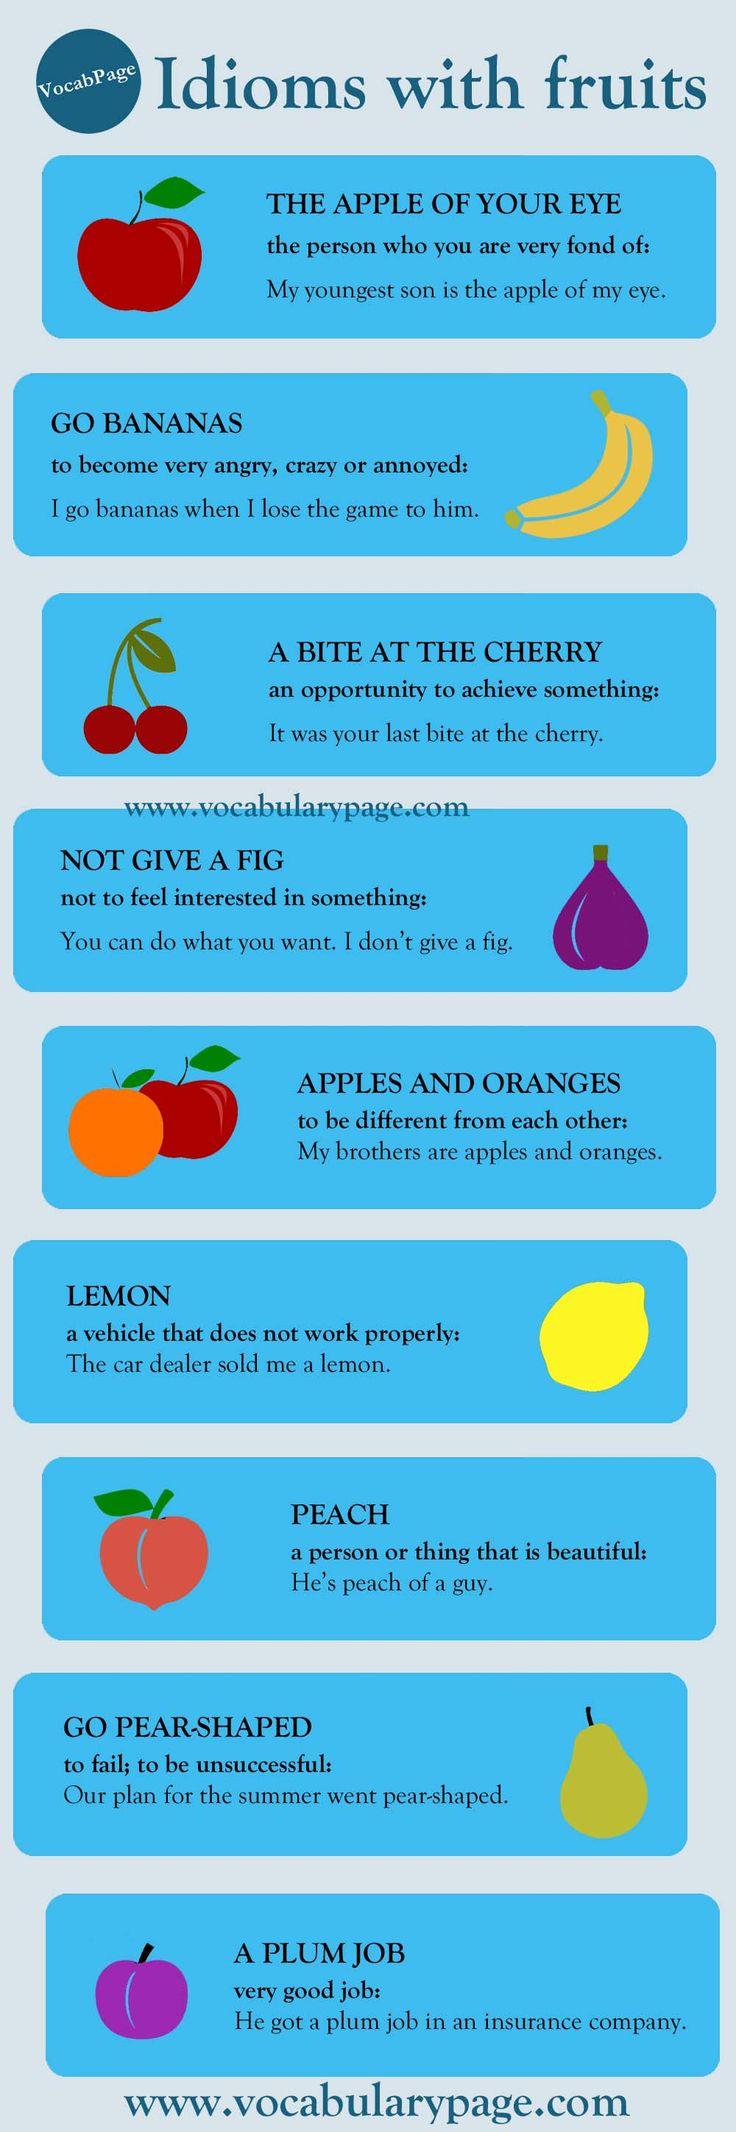 Idioms with fruits www.vocabularypage.com